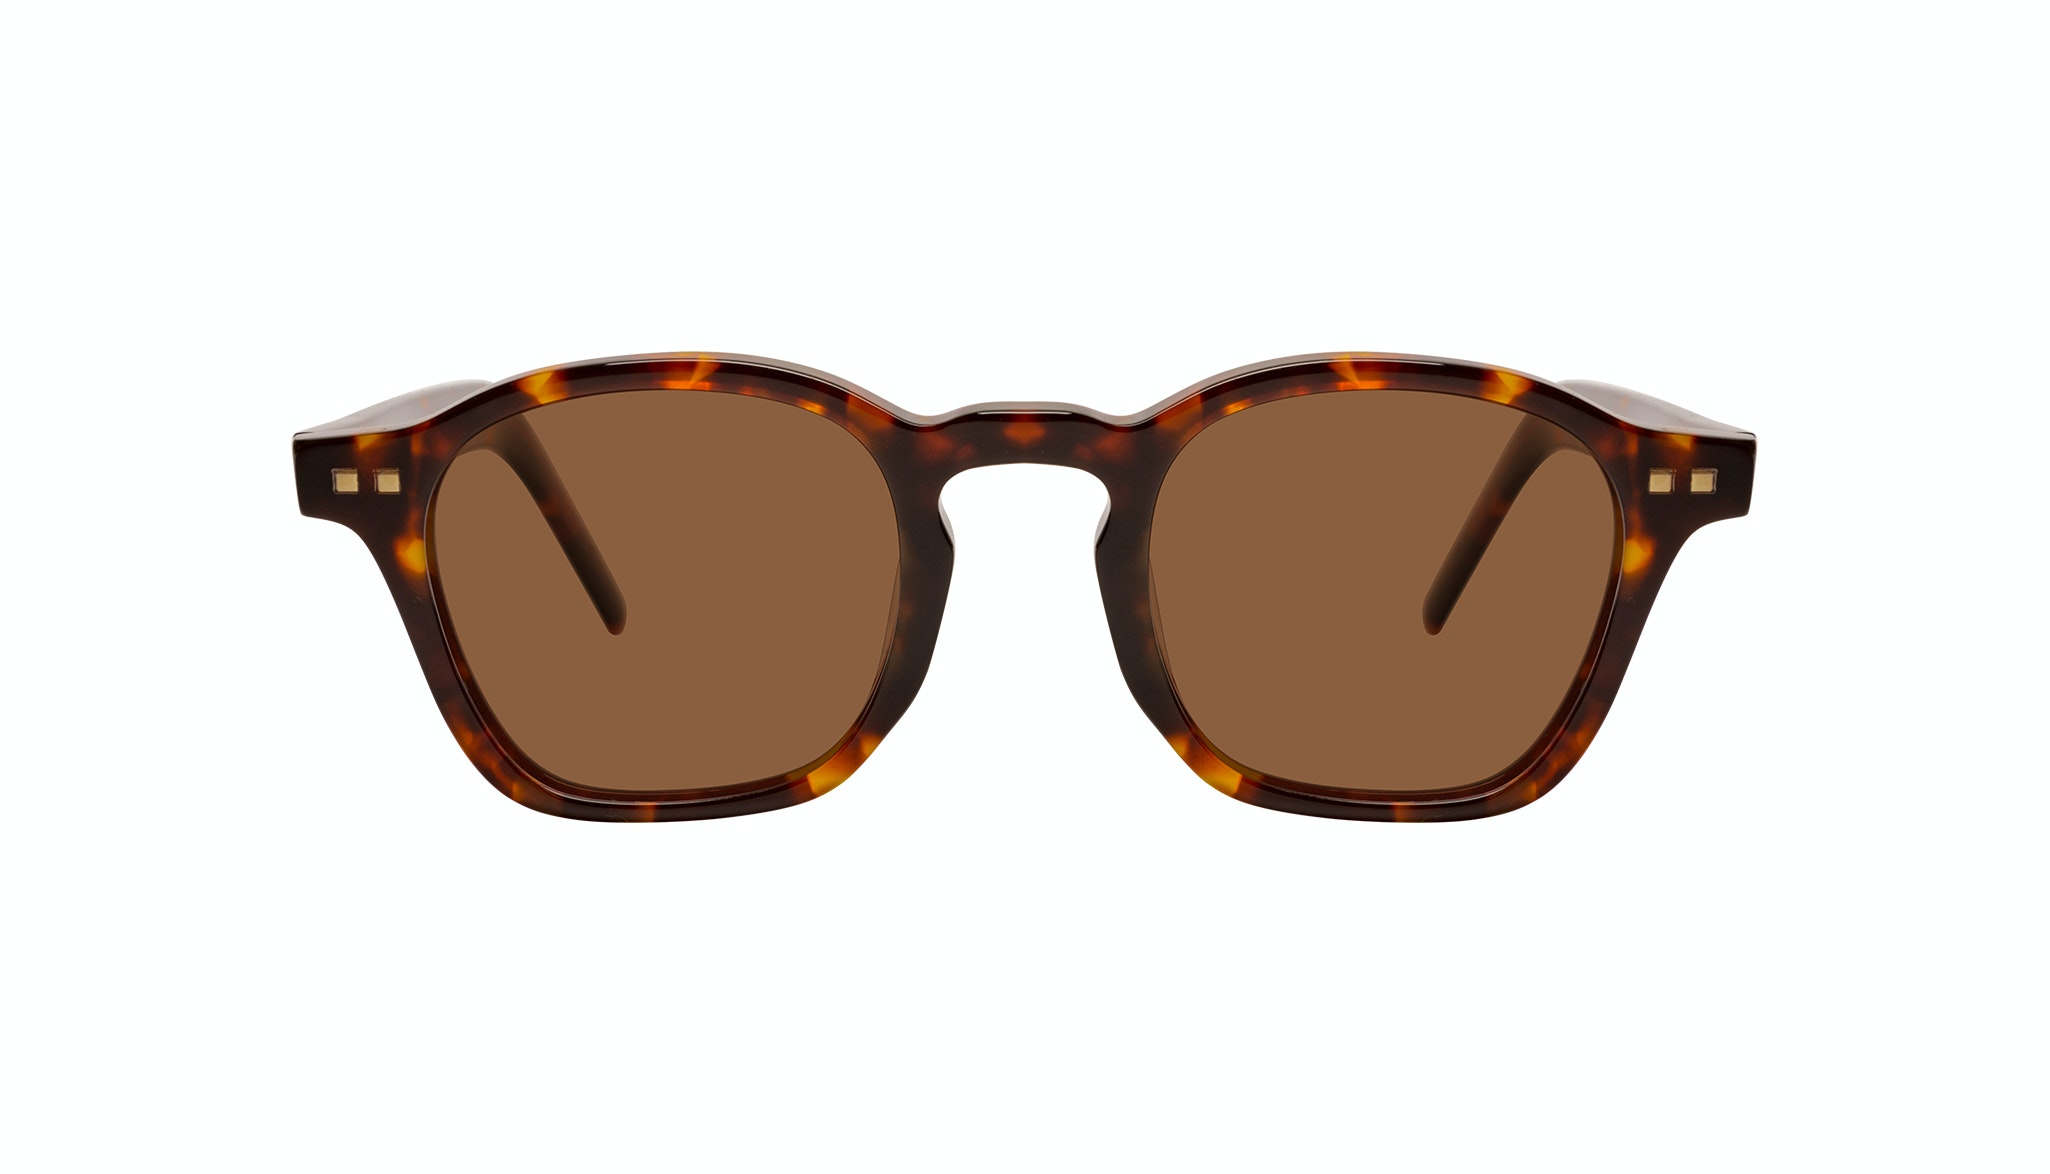 Affordable Fashion Glasses Square Sunglasses Men Brisk Tortoise Front